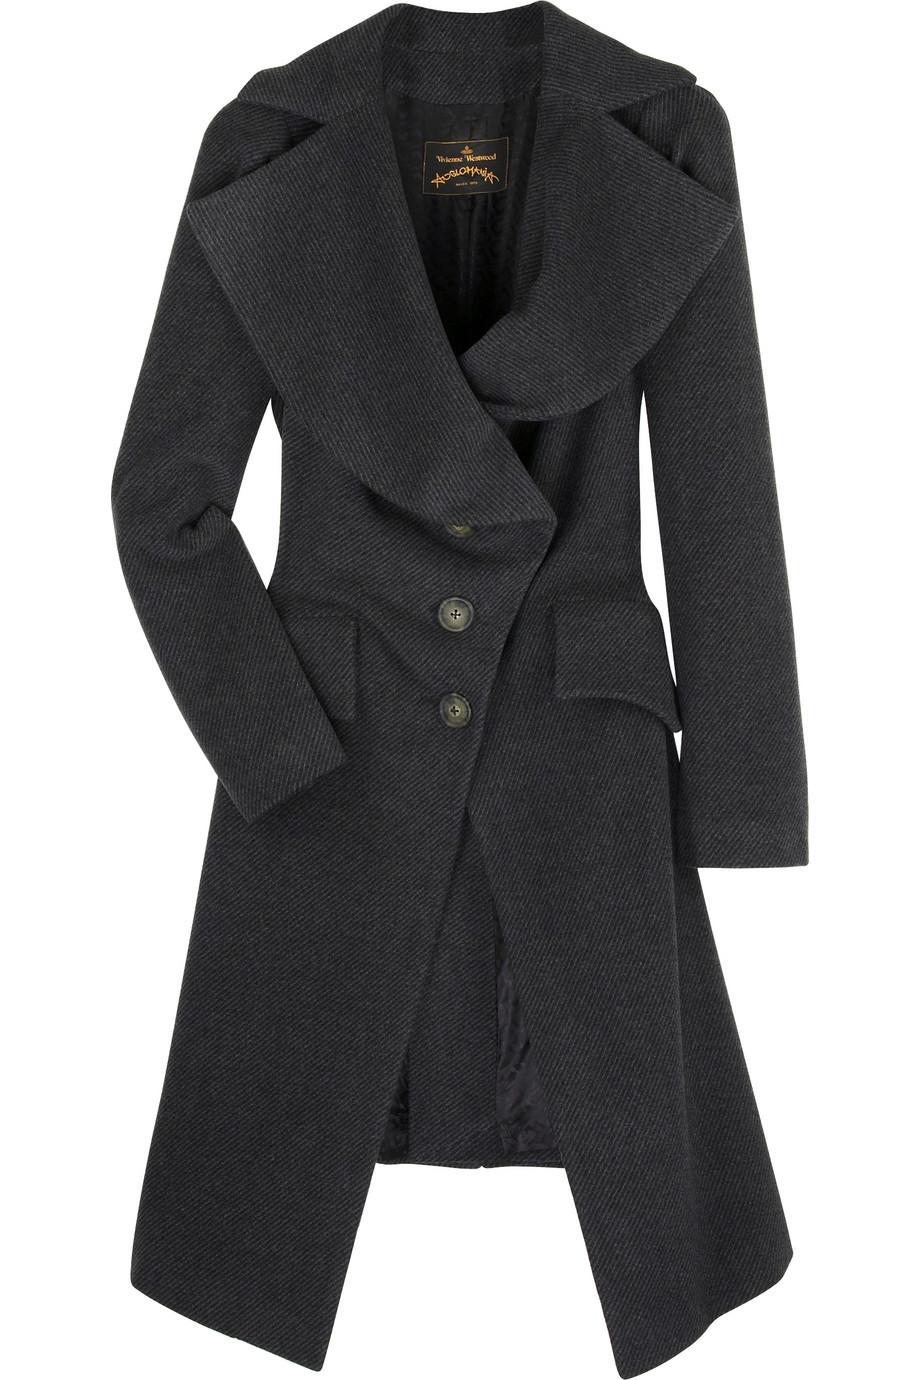 Vivienne Westwood Anglomania Jabot herringbone coat |NET-A-PORTER.COM from net-a-porter.com